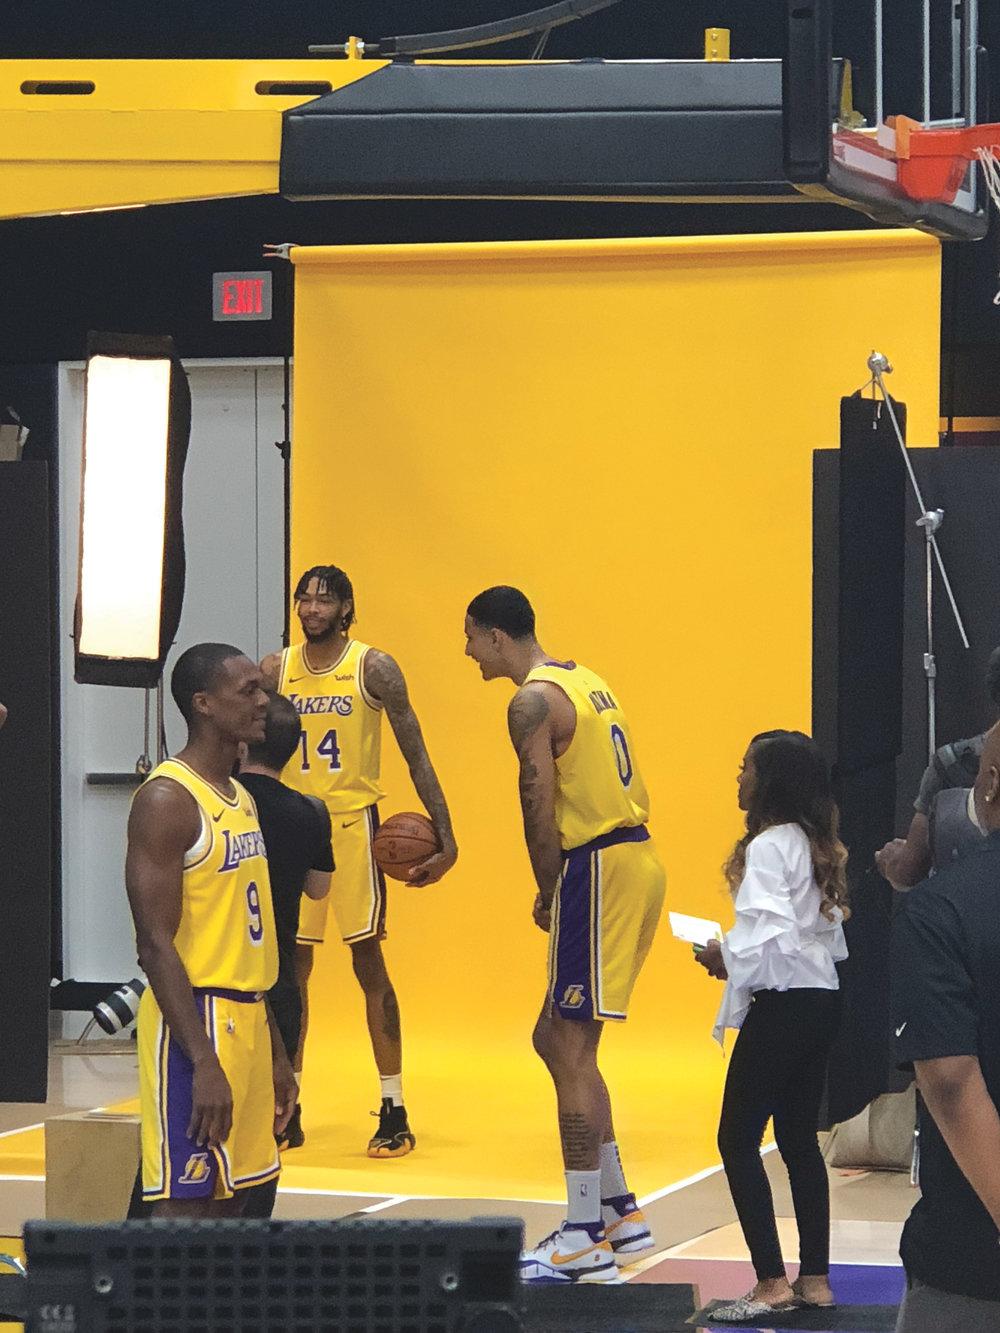 Brandon Ingram (14) and Rajon Rando (9) pose for pictures as Kyle Kuzma (0) watches on Lakers Media Day. (Los Angeles News Observer photo)